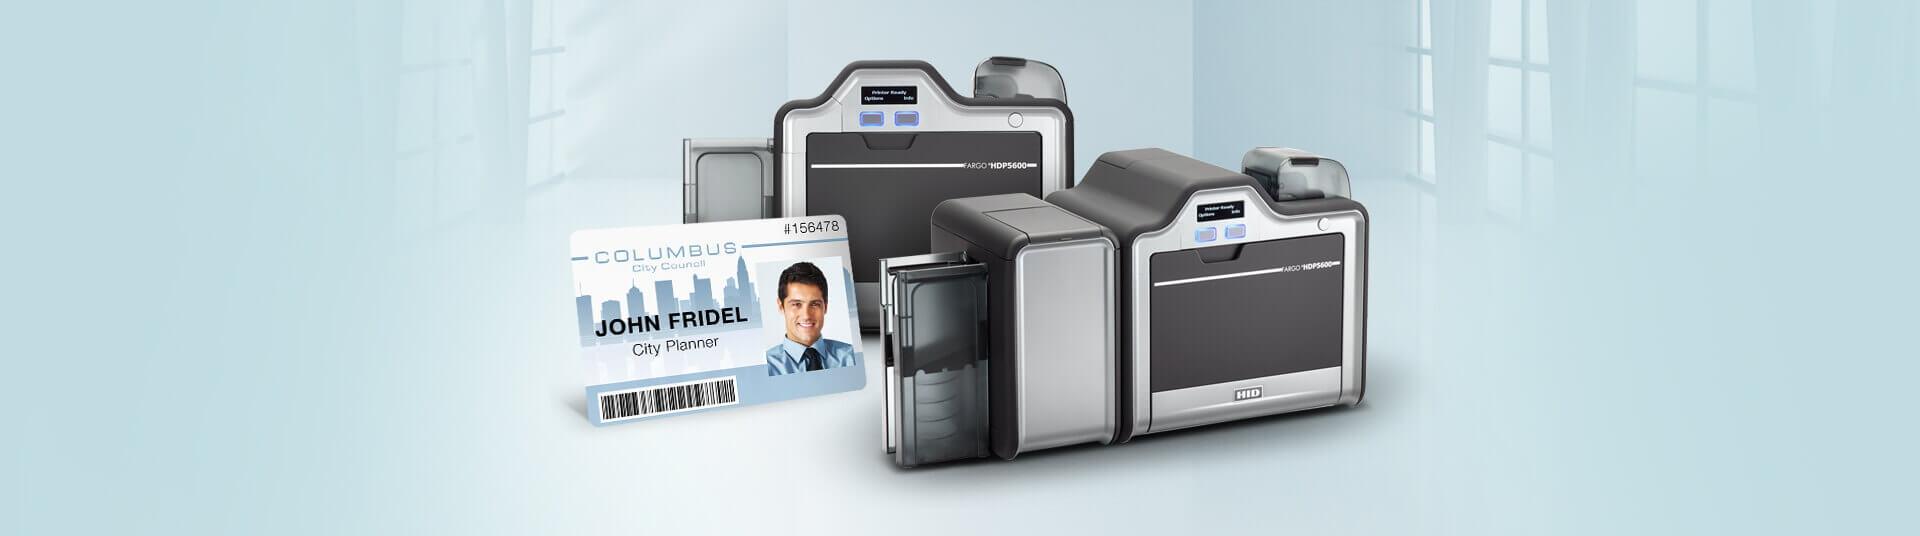 Fargo HDP5600 ID Card Printers